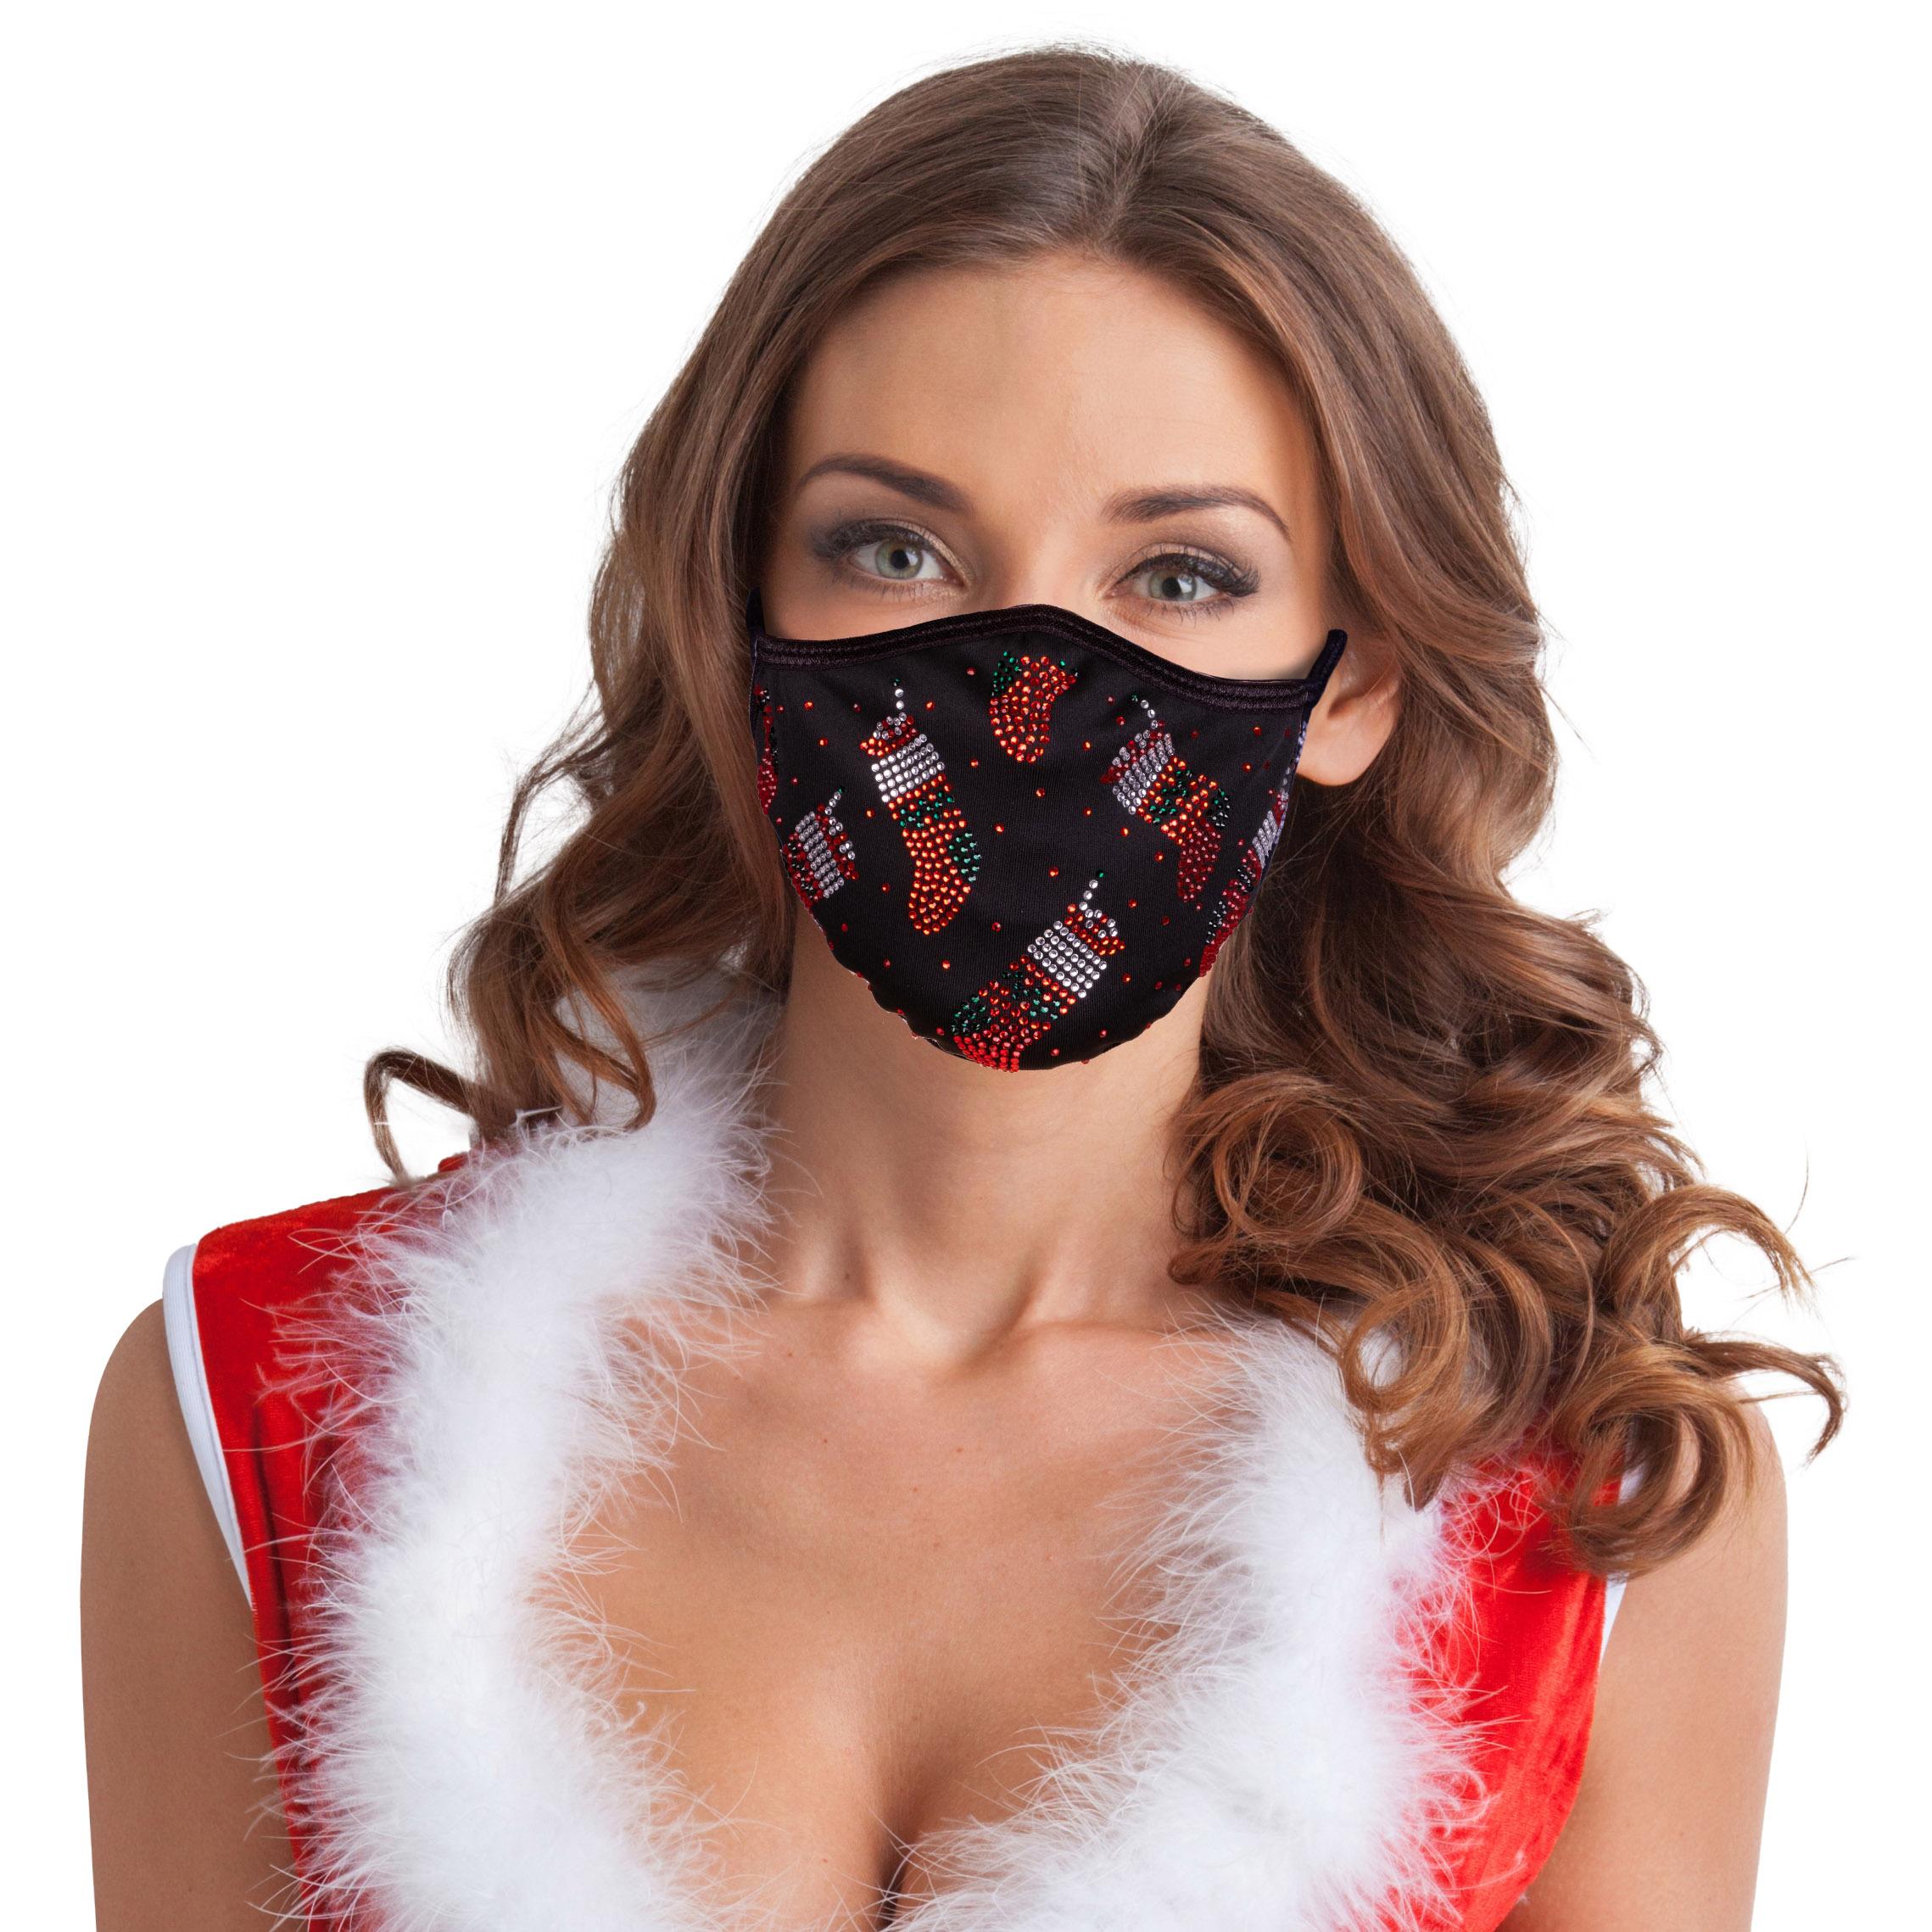 Festtagsmaske Strass Weihnachtsstrumpf